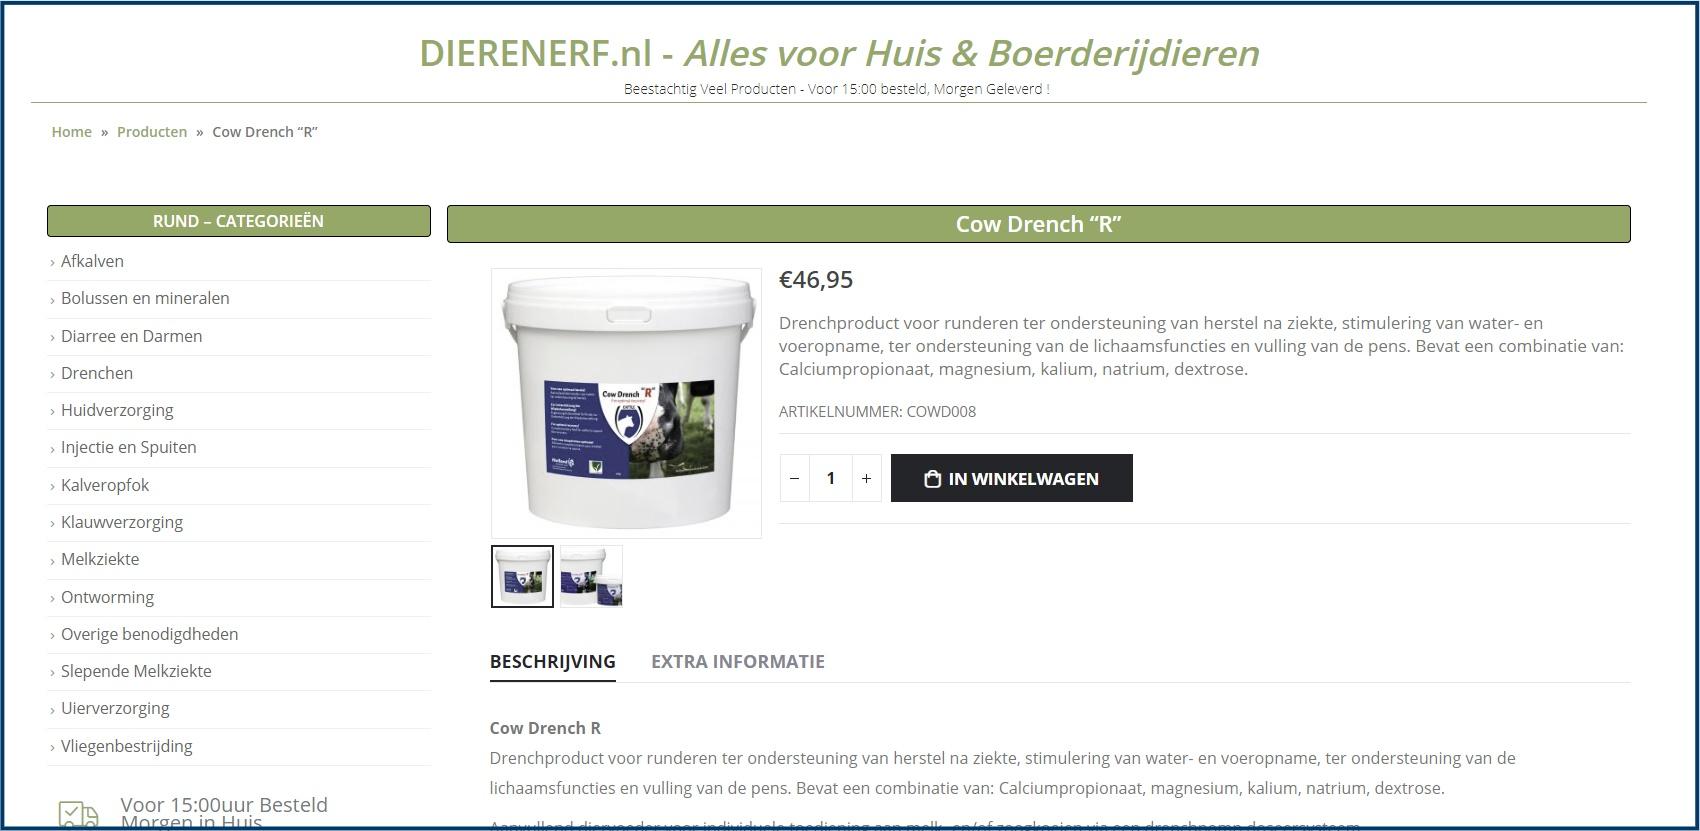 WooCommerce Product Detail Pagina met Categorieën